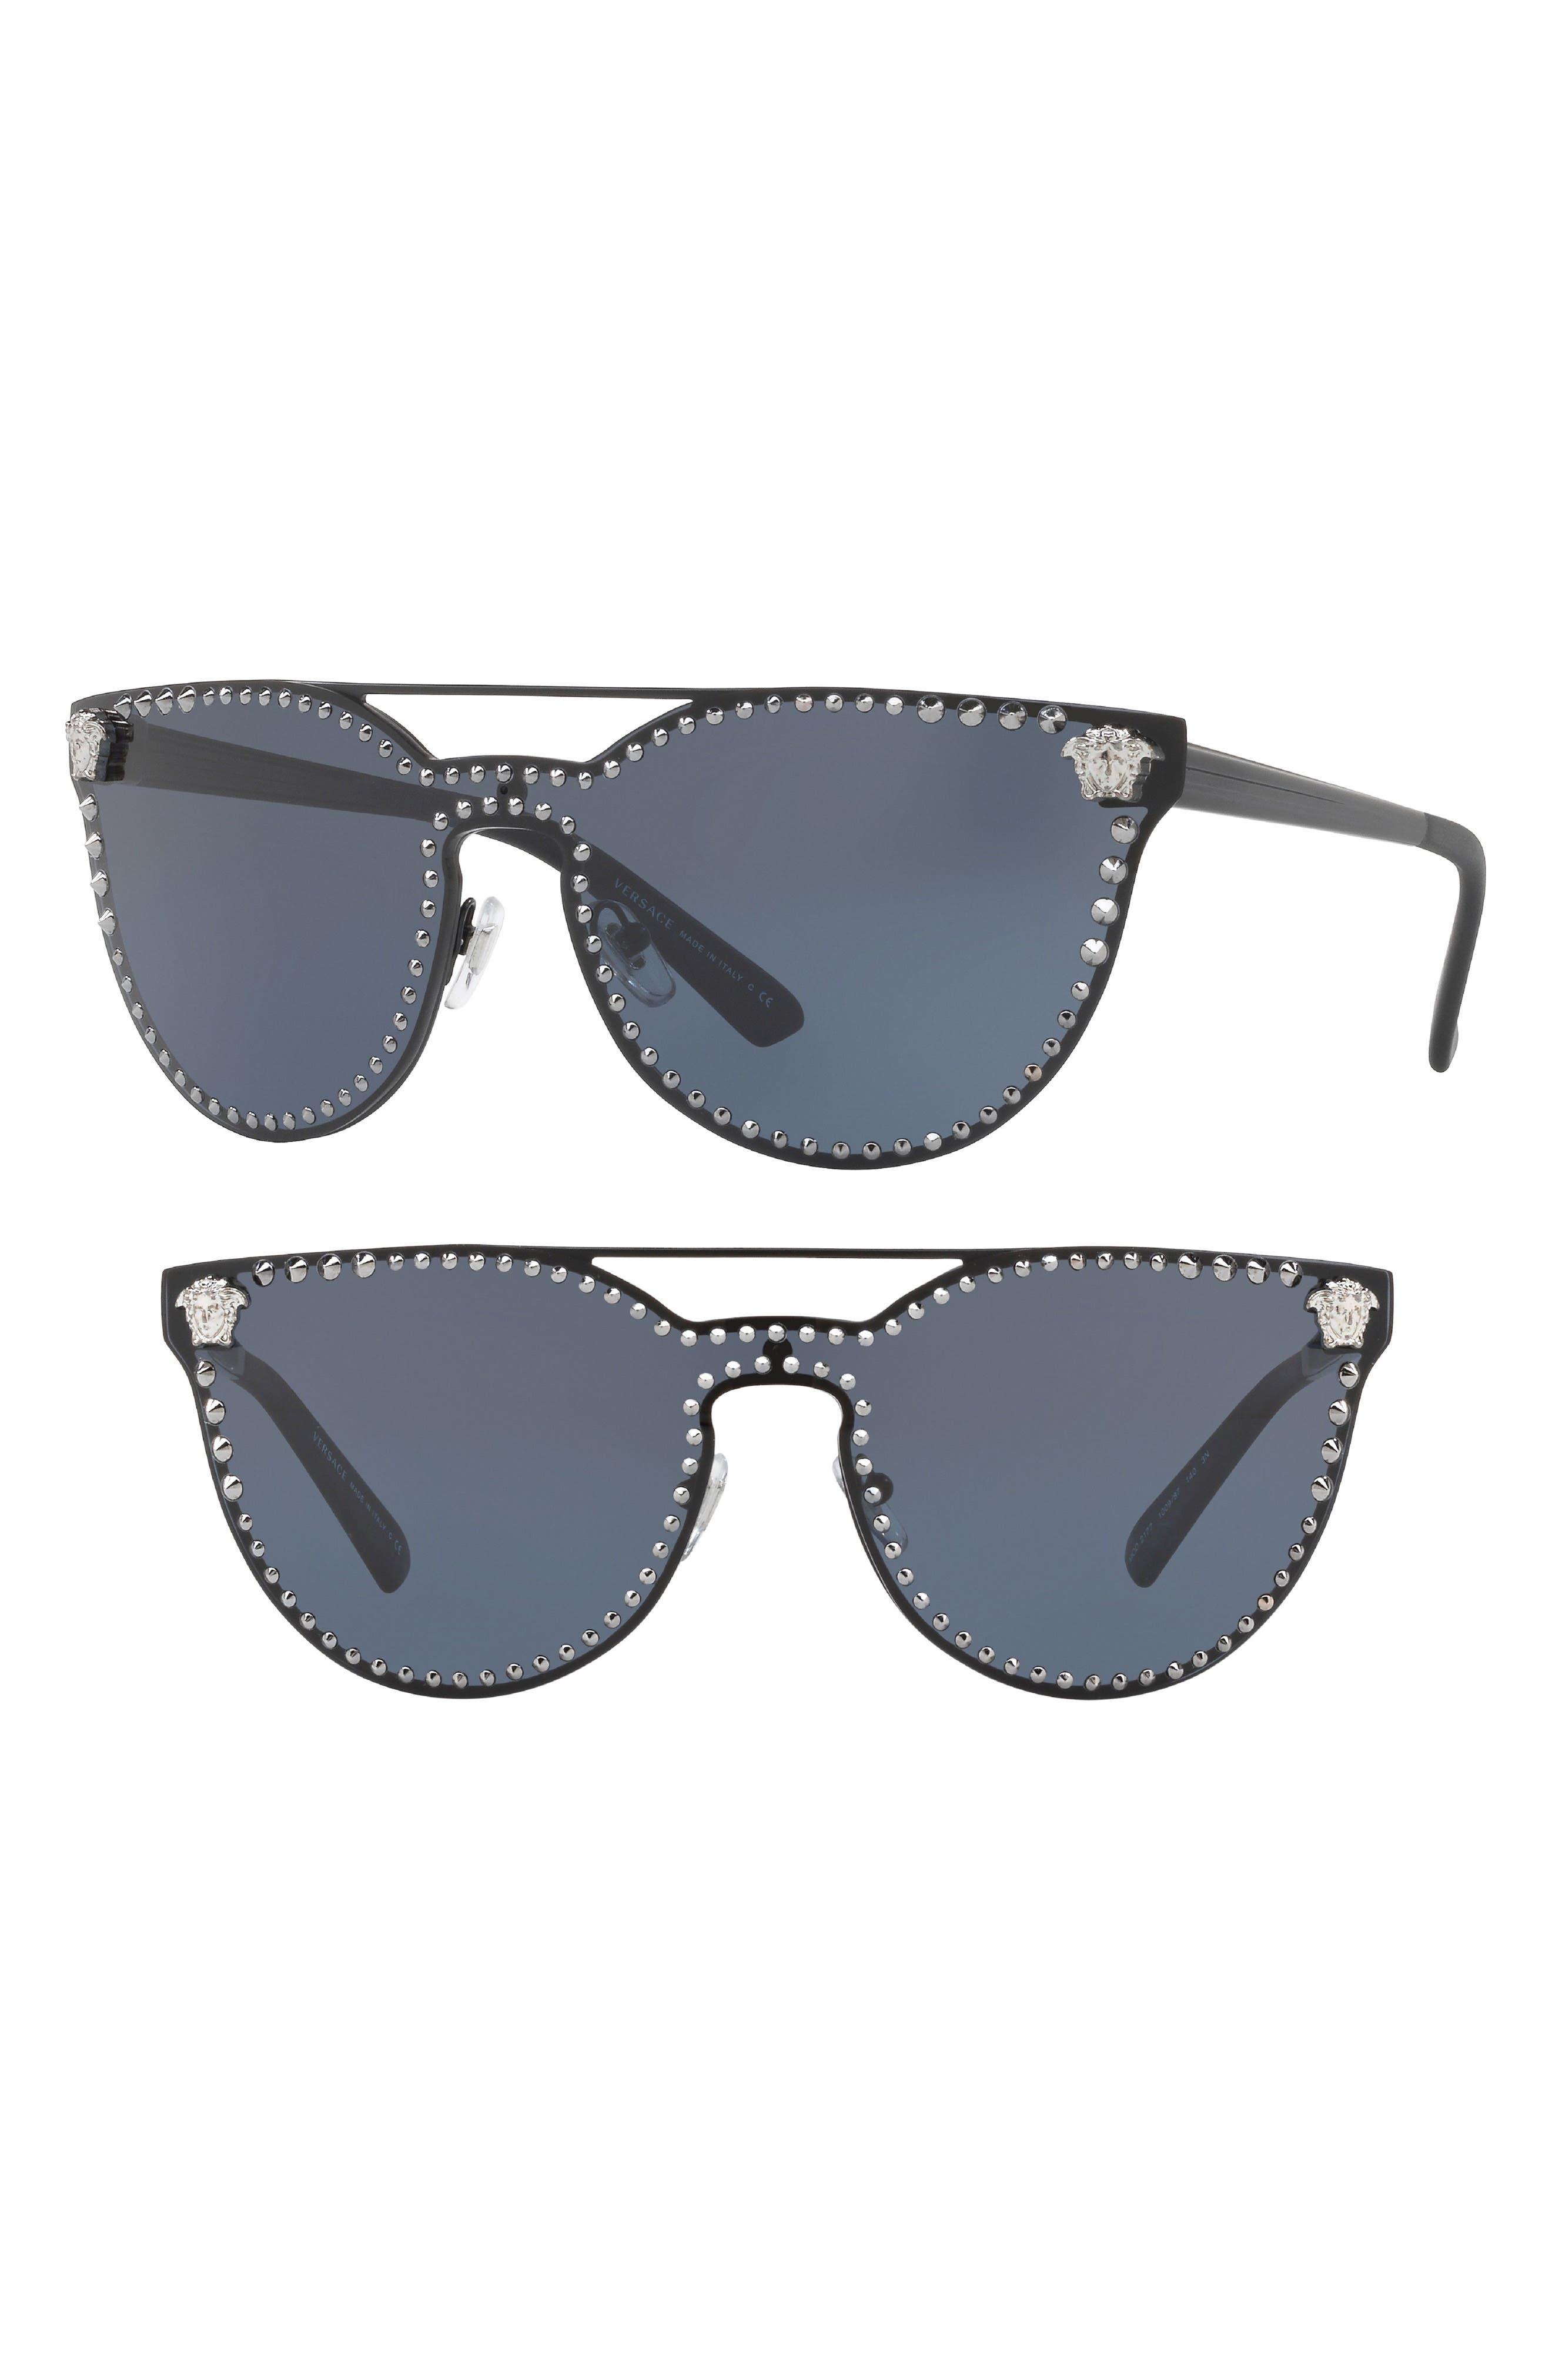 Medusa Stud 145mm Shield Sunglasses,                             Main thumbnail 1, color,                             MATTE BLACK SOLID